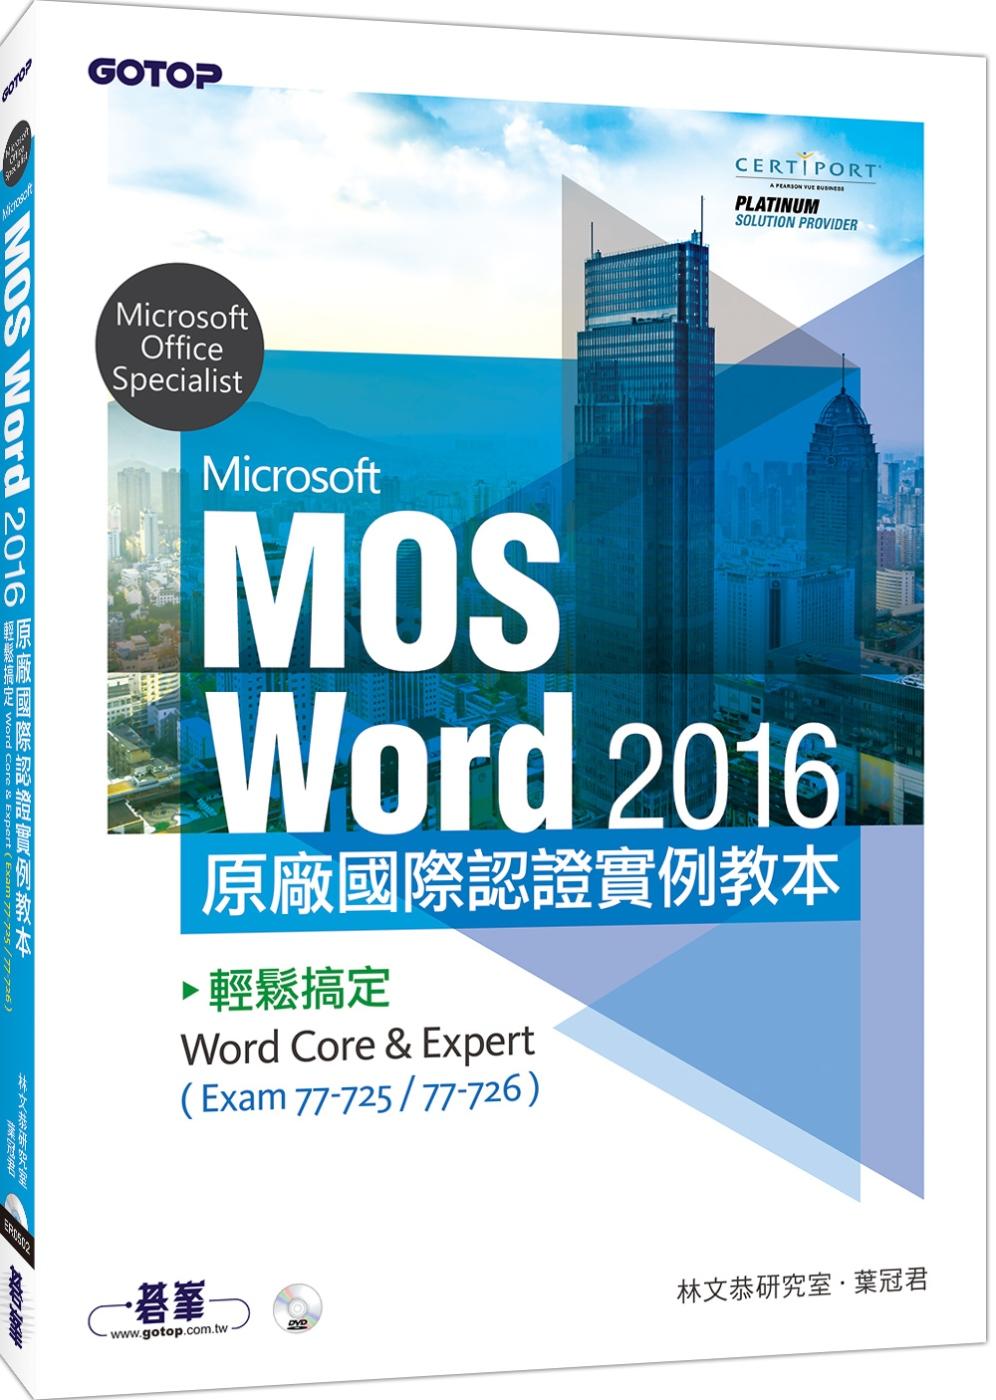 Microsoft MOS Word 2016 原廠國際認證實例教本:輕鬆搞定Word Core & Expert